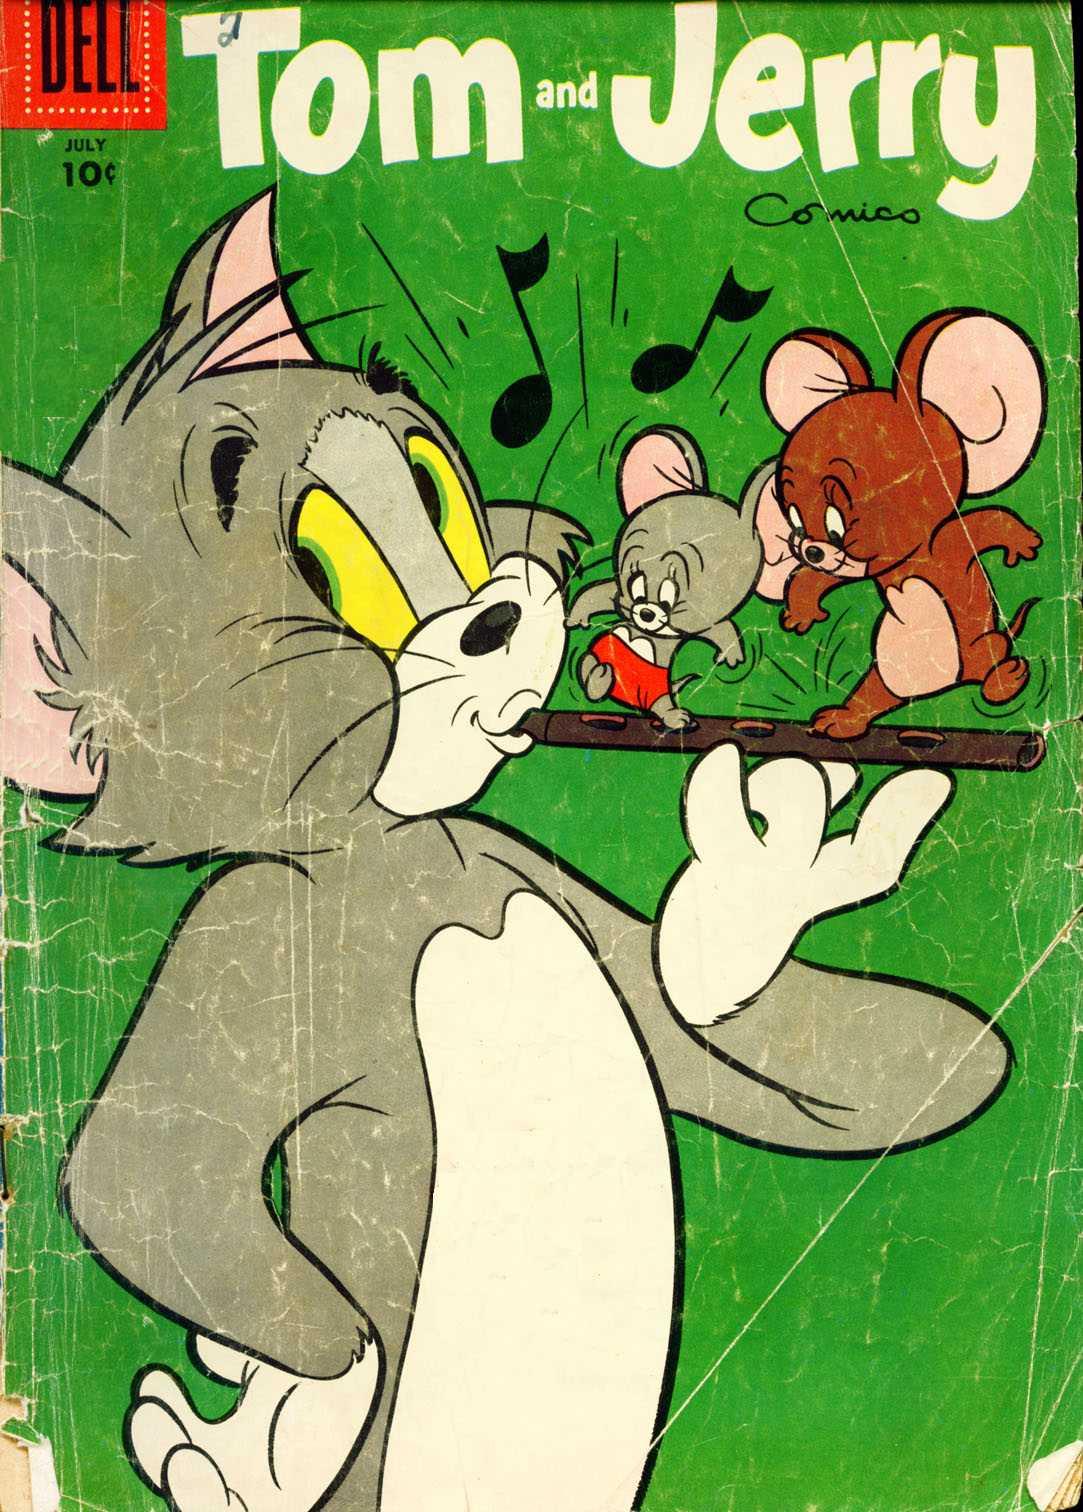 Tom & Jerry Comics 144 Page 1